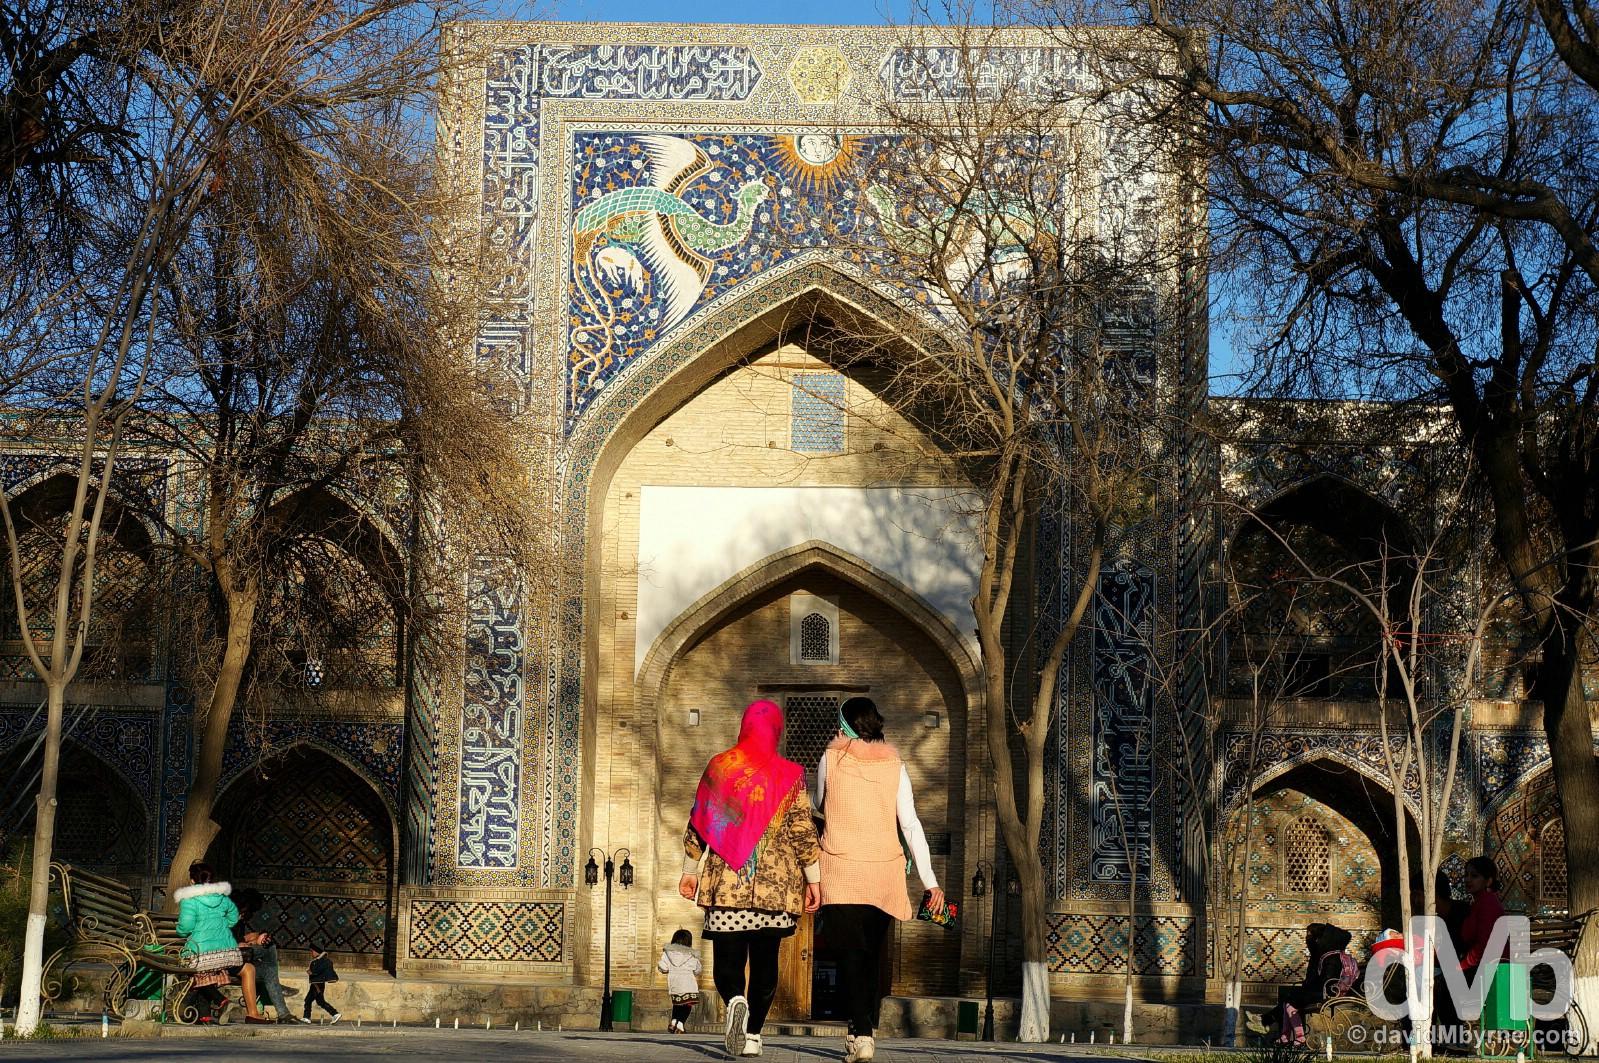 The facade of the Nadri Divanbegi Medressa in Lyabi-Hauz, Bukhara, Uzbekistan. March 12, 2015.